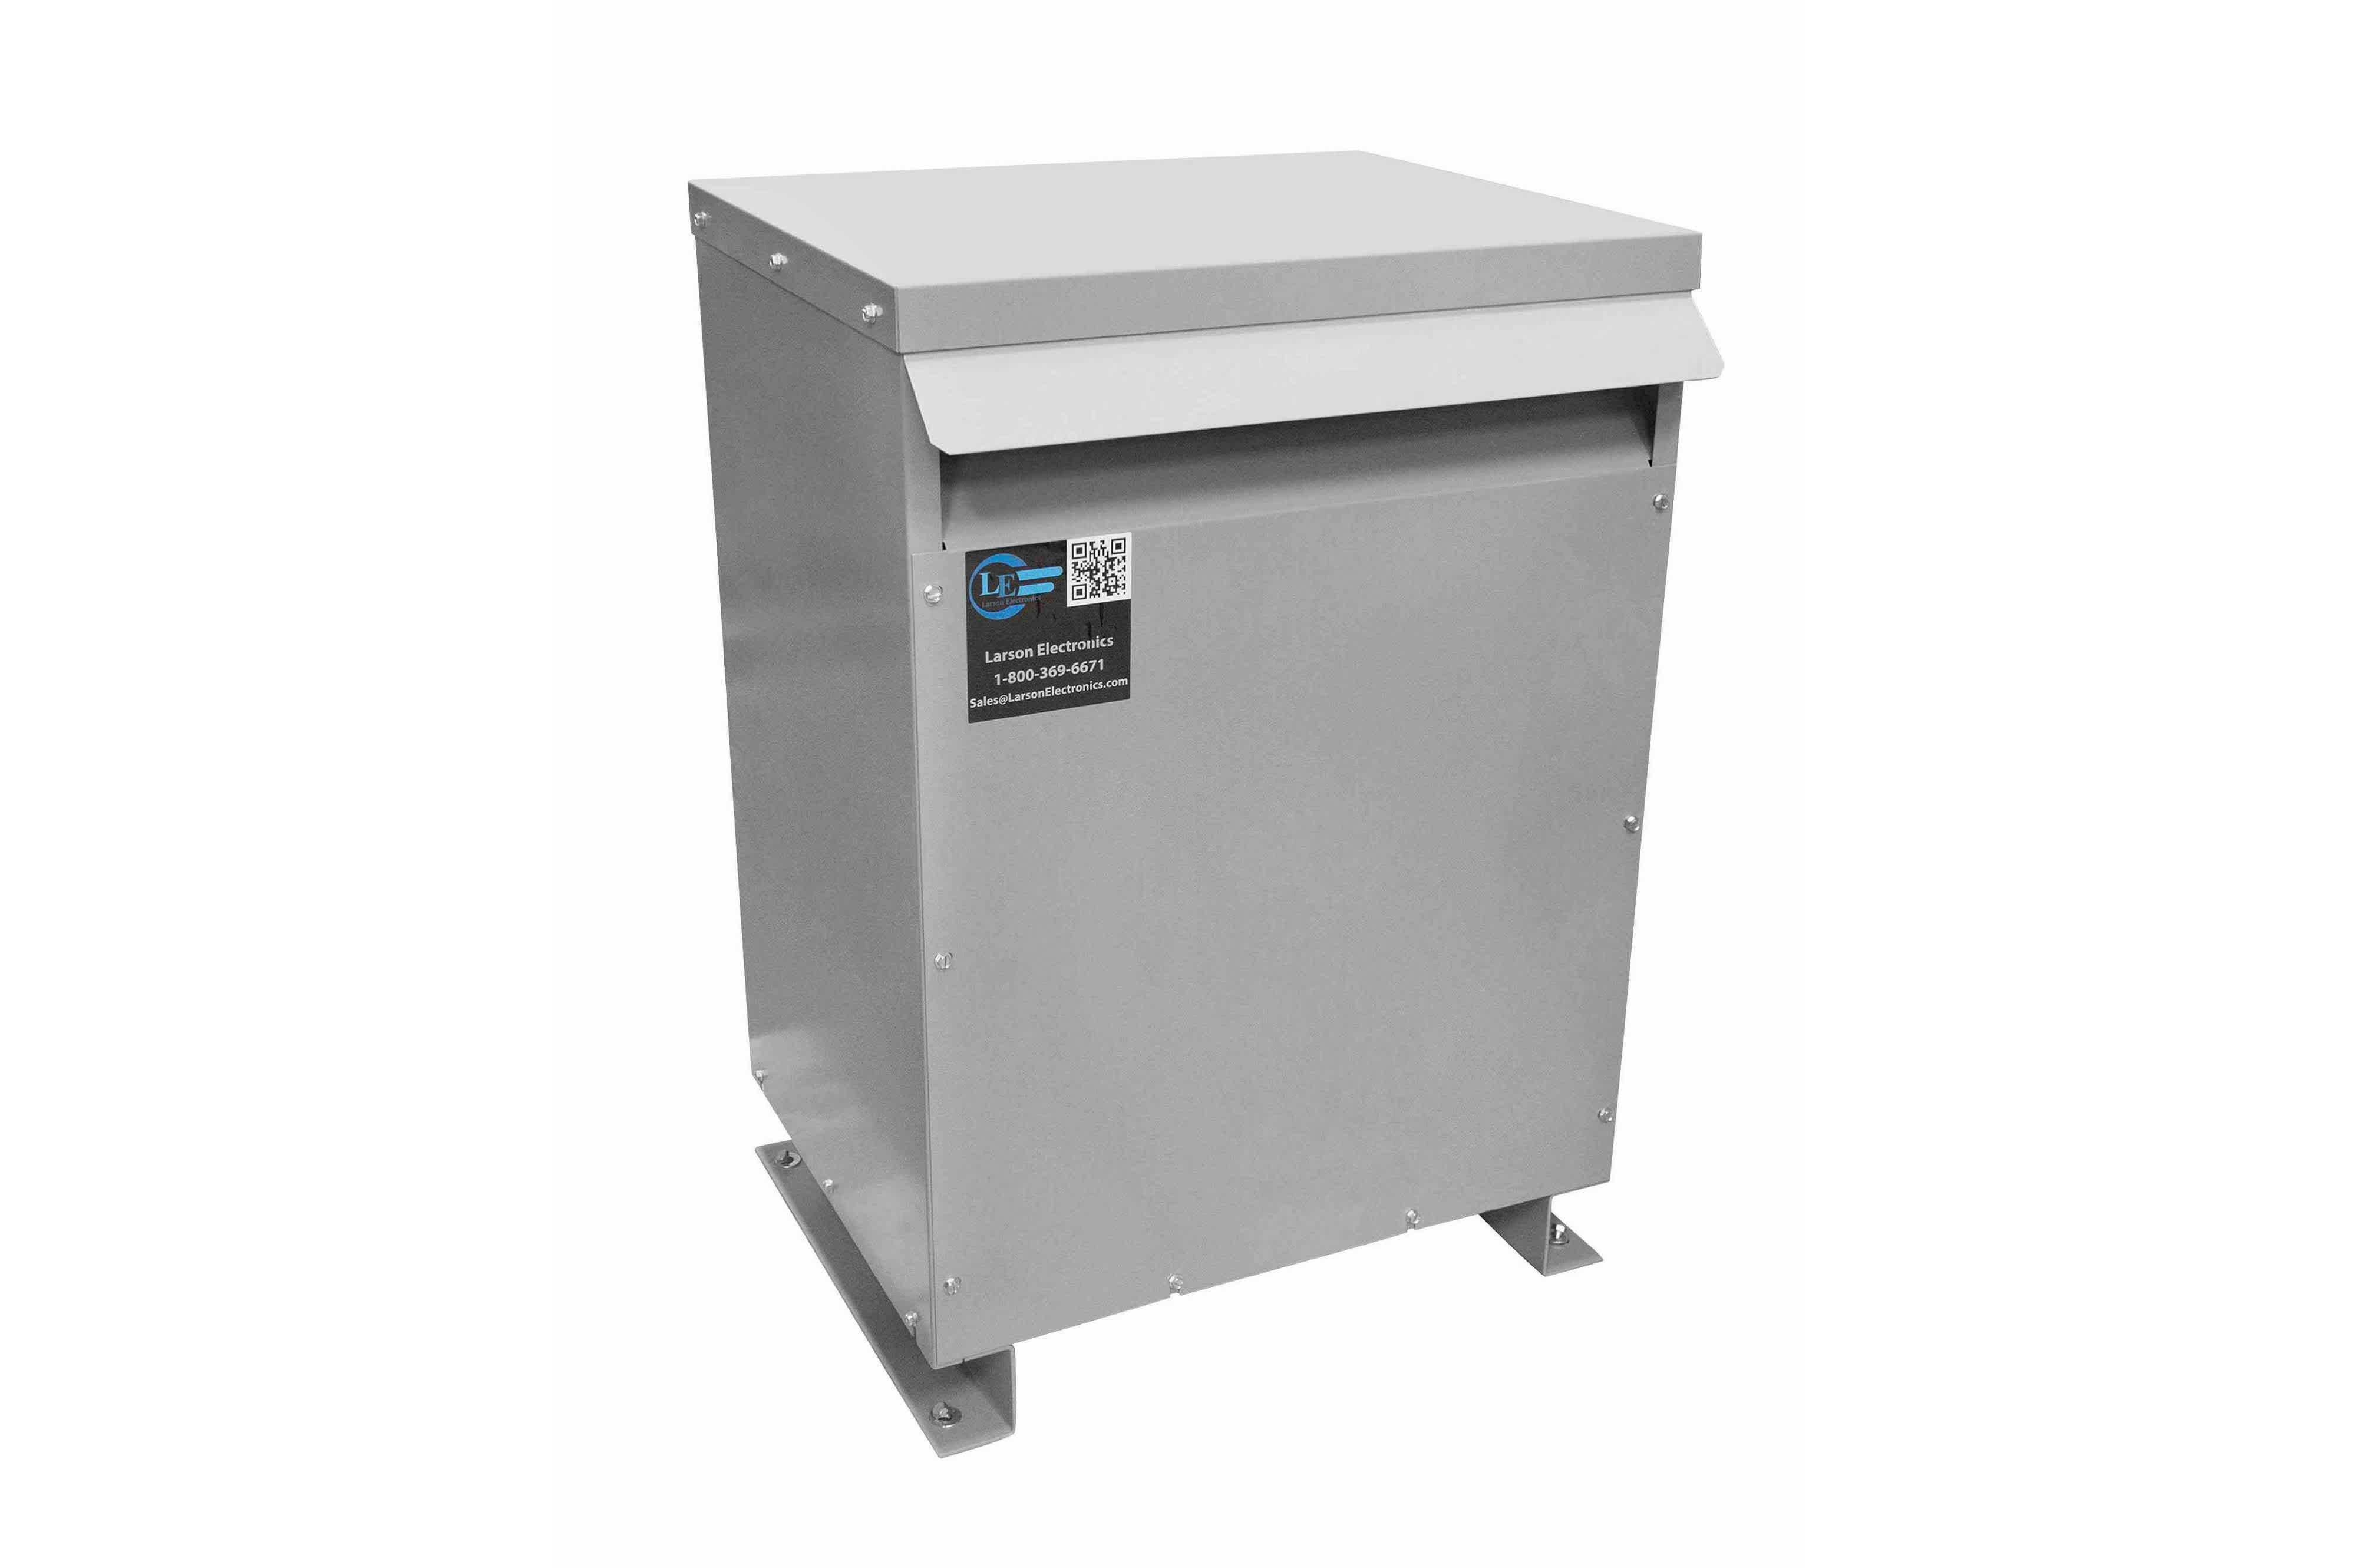 900 kVA 3PH Isolation Transformer, 240V Wye Primary, 208Y/120 Wye-N Secondary, N3R, Ventilated, 60 Hz